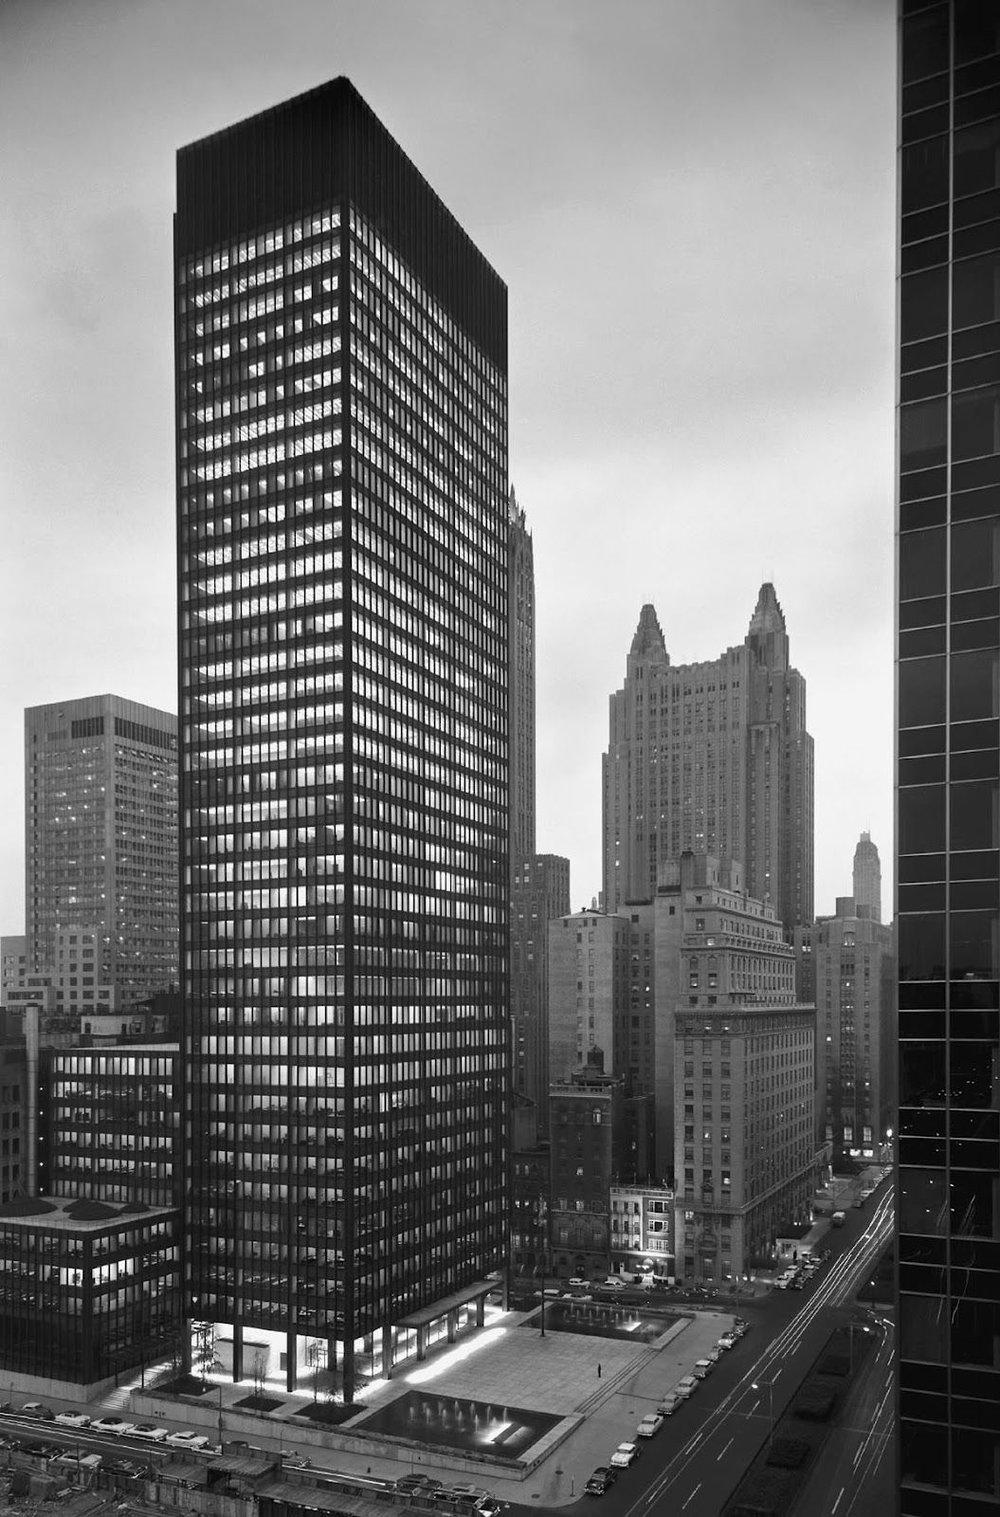 Mies van der Rohe example of International Style